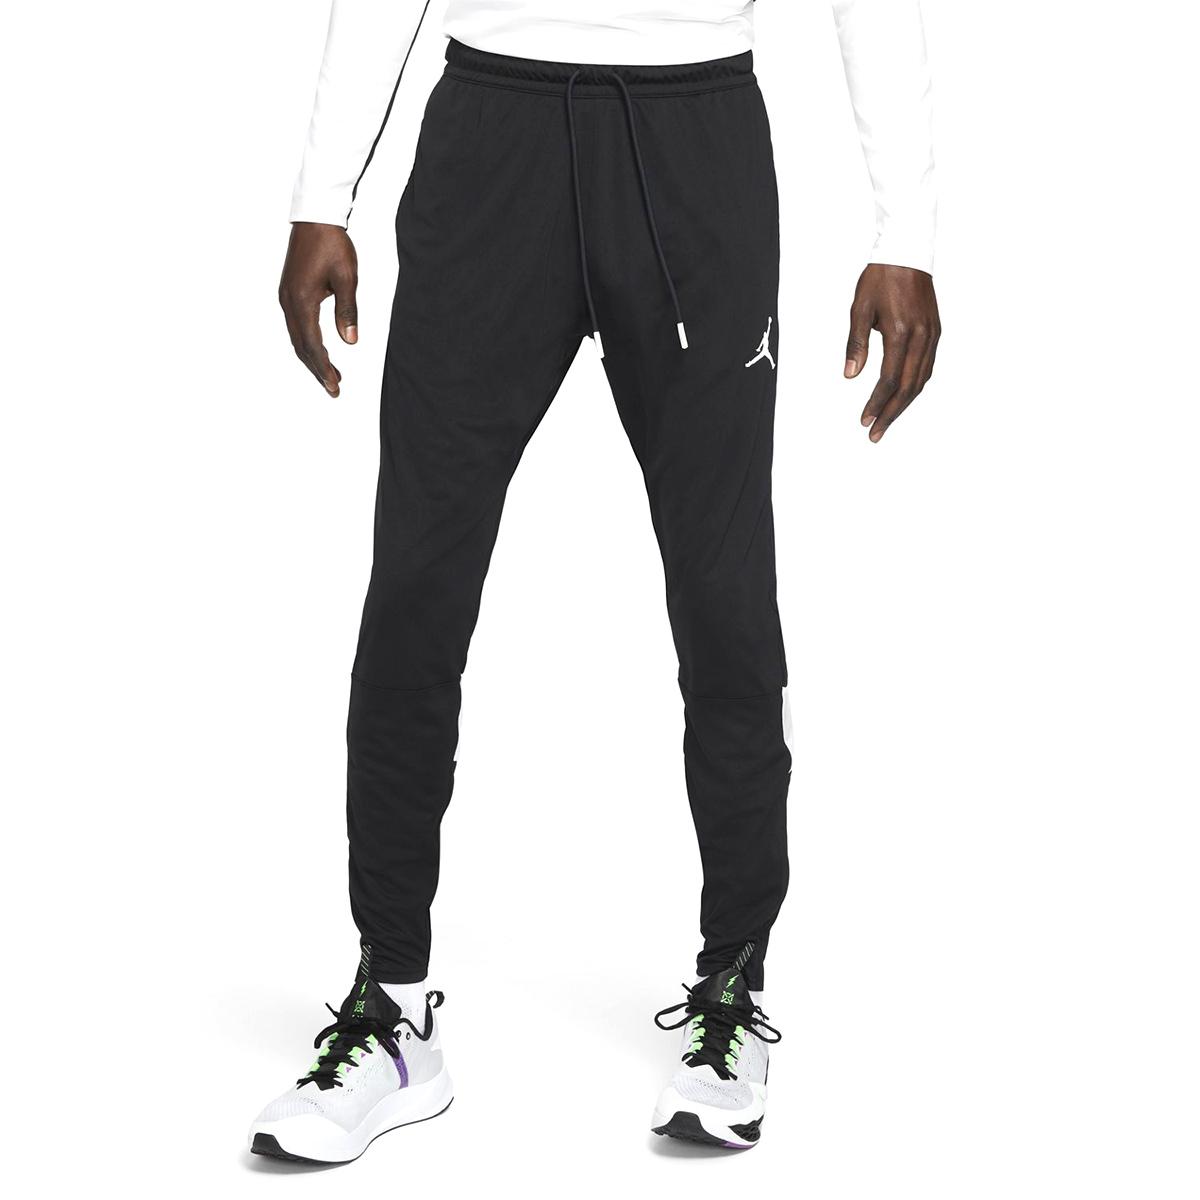 M Jordan Df Air NBA Erkek Siyah Basketbol Eşofman Altı CZ4790-010